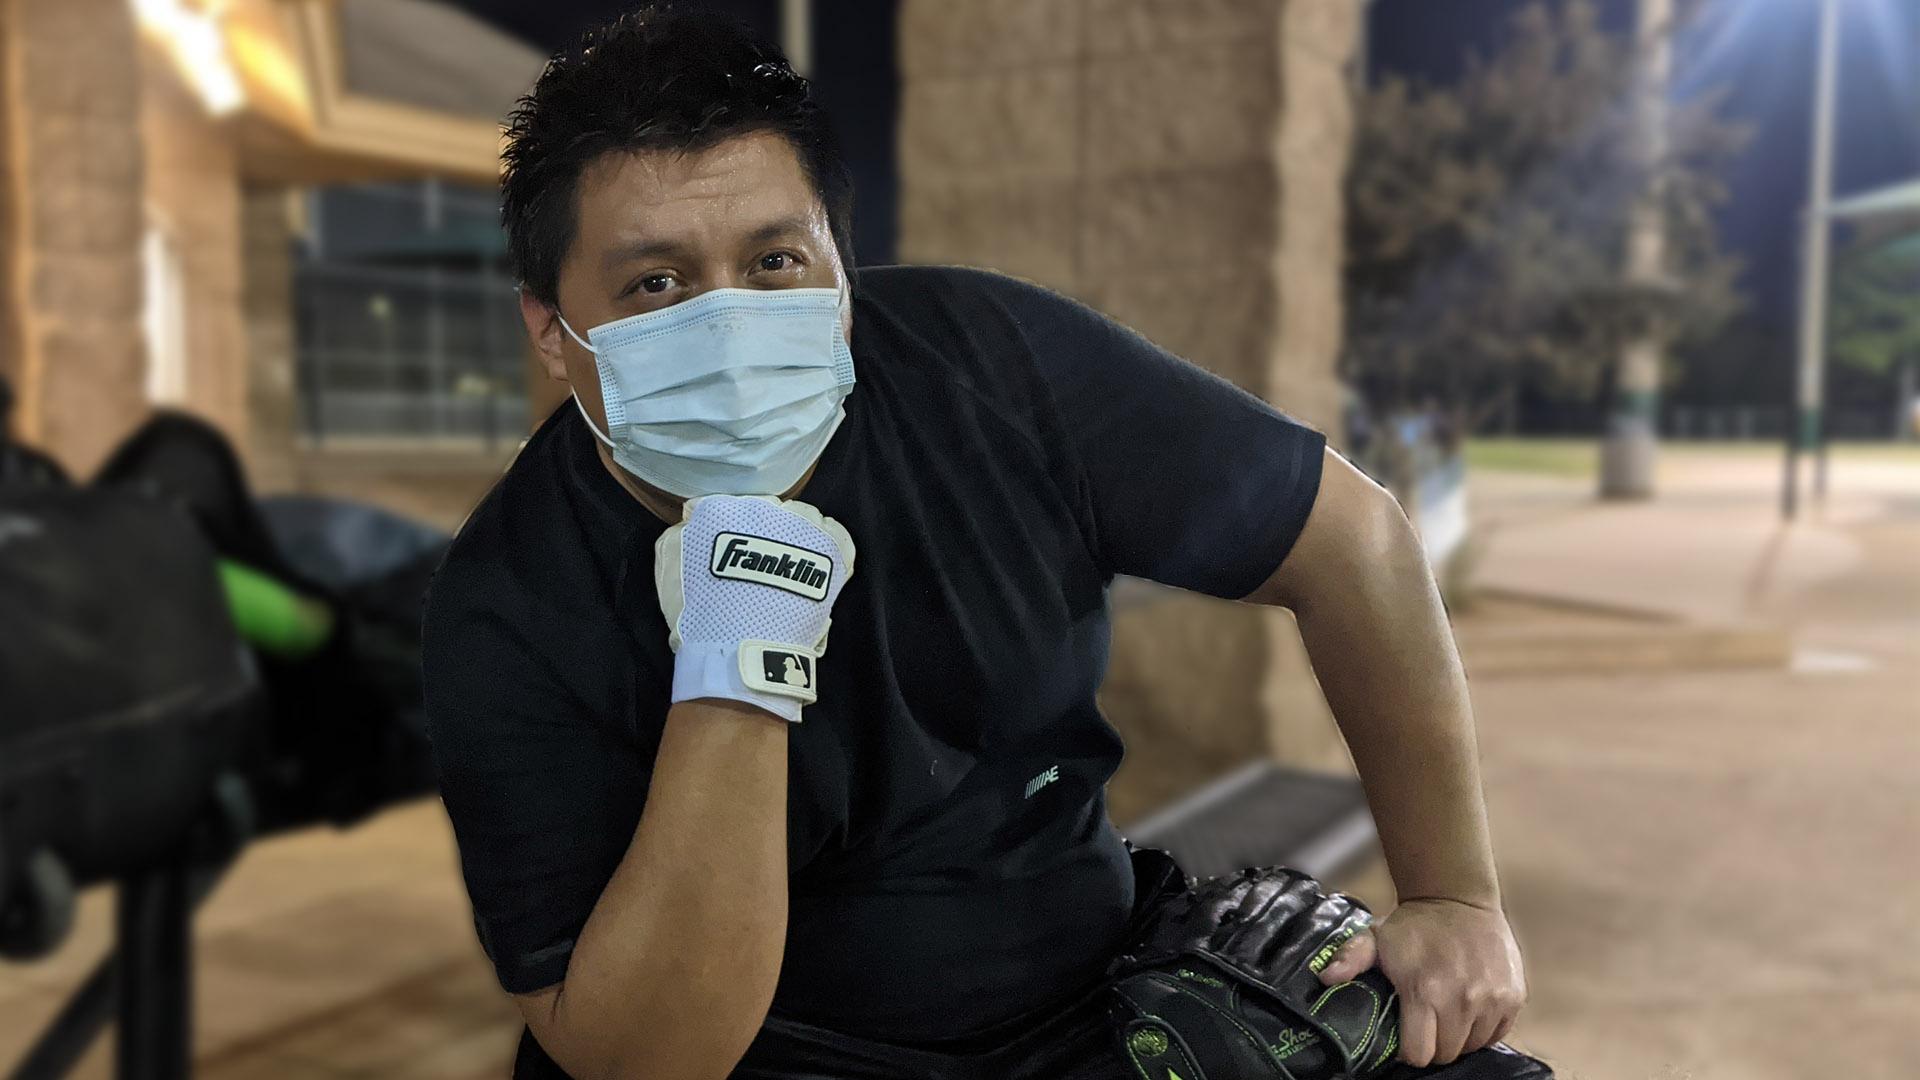 Dante Ramos-Delgado poses for a photo at the softball fields.